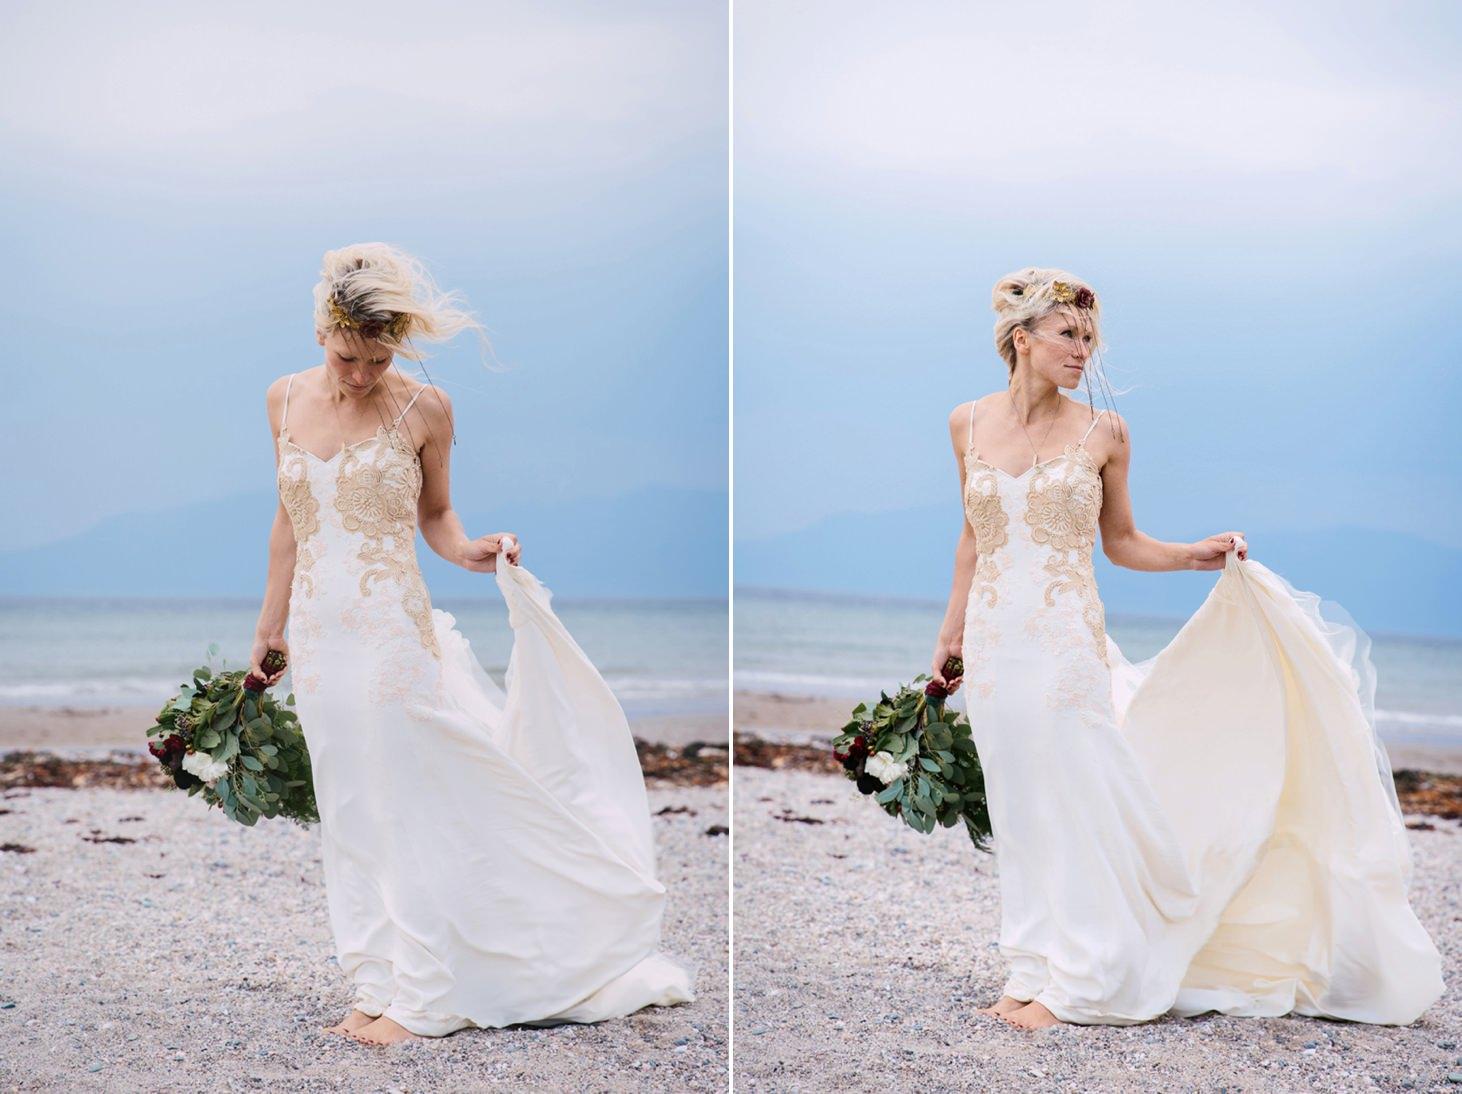 sle of bute wedding photography bride